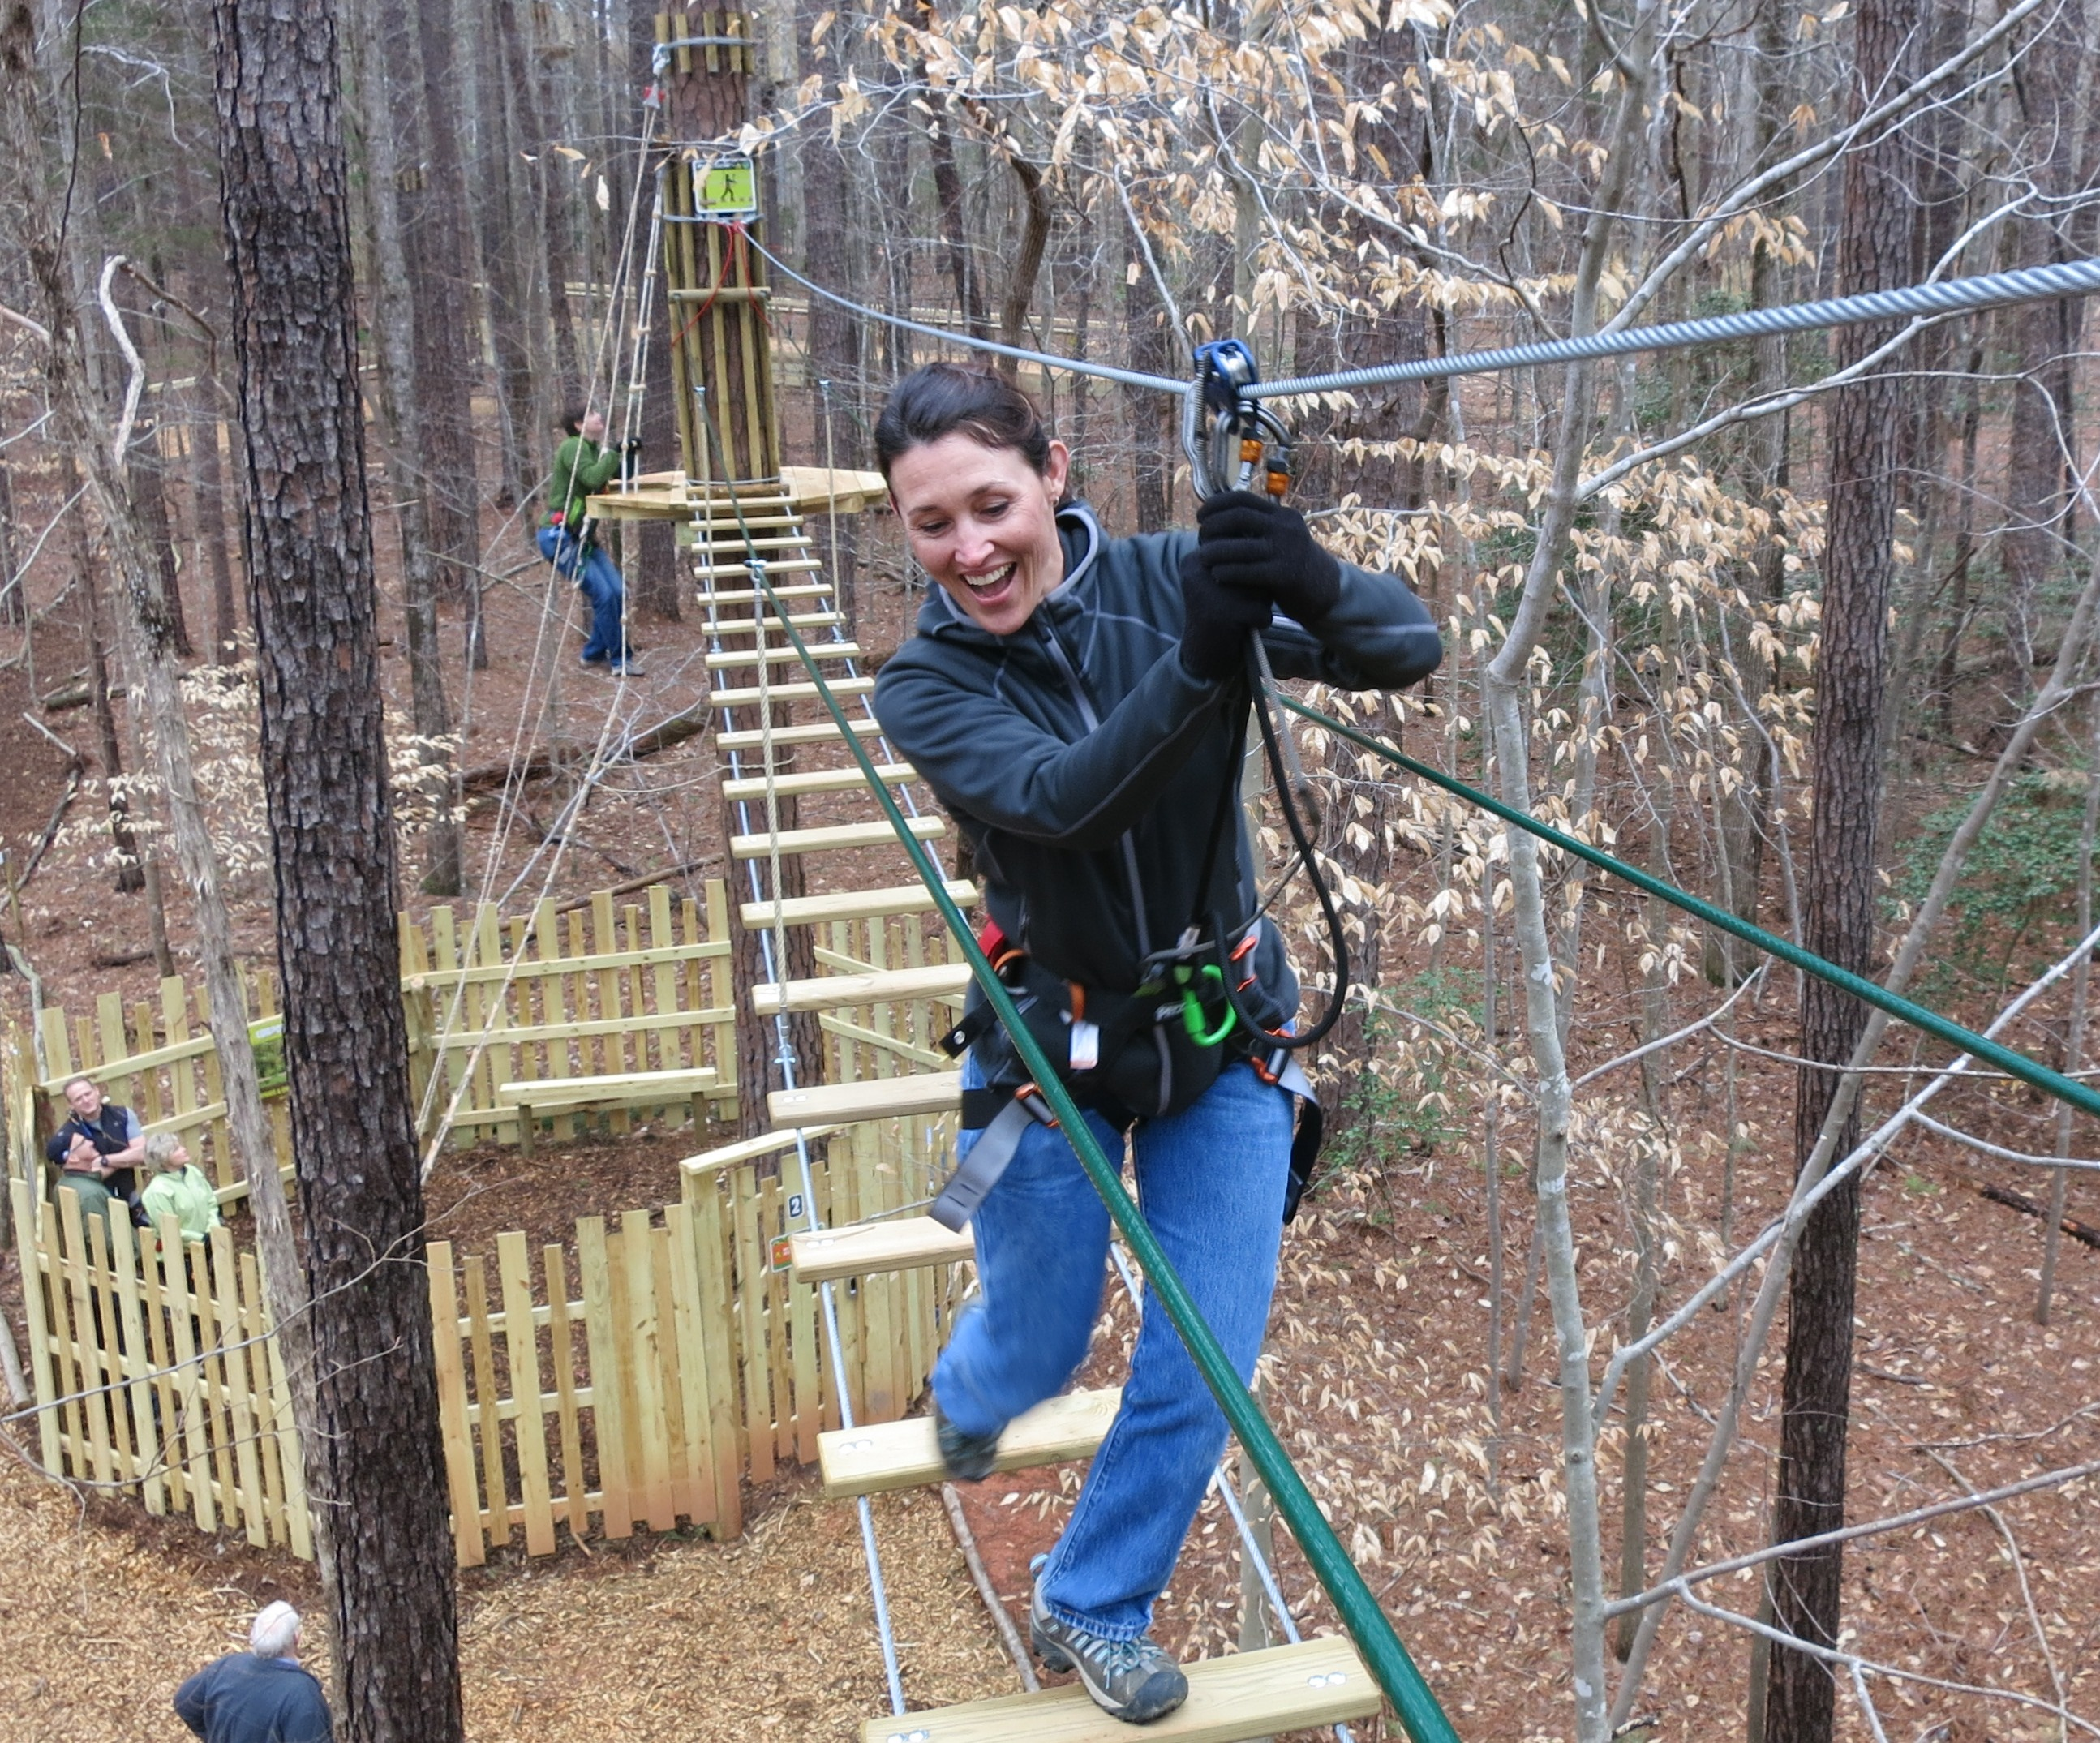 Go Ape Treetop Adventure Course   Courtesy of Blue Jay Point